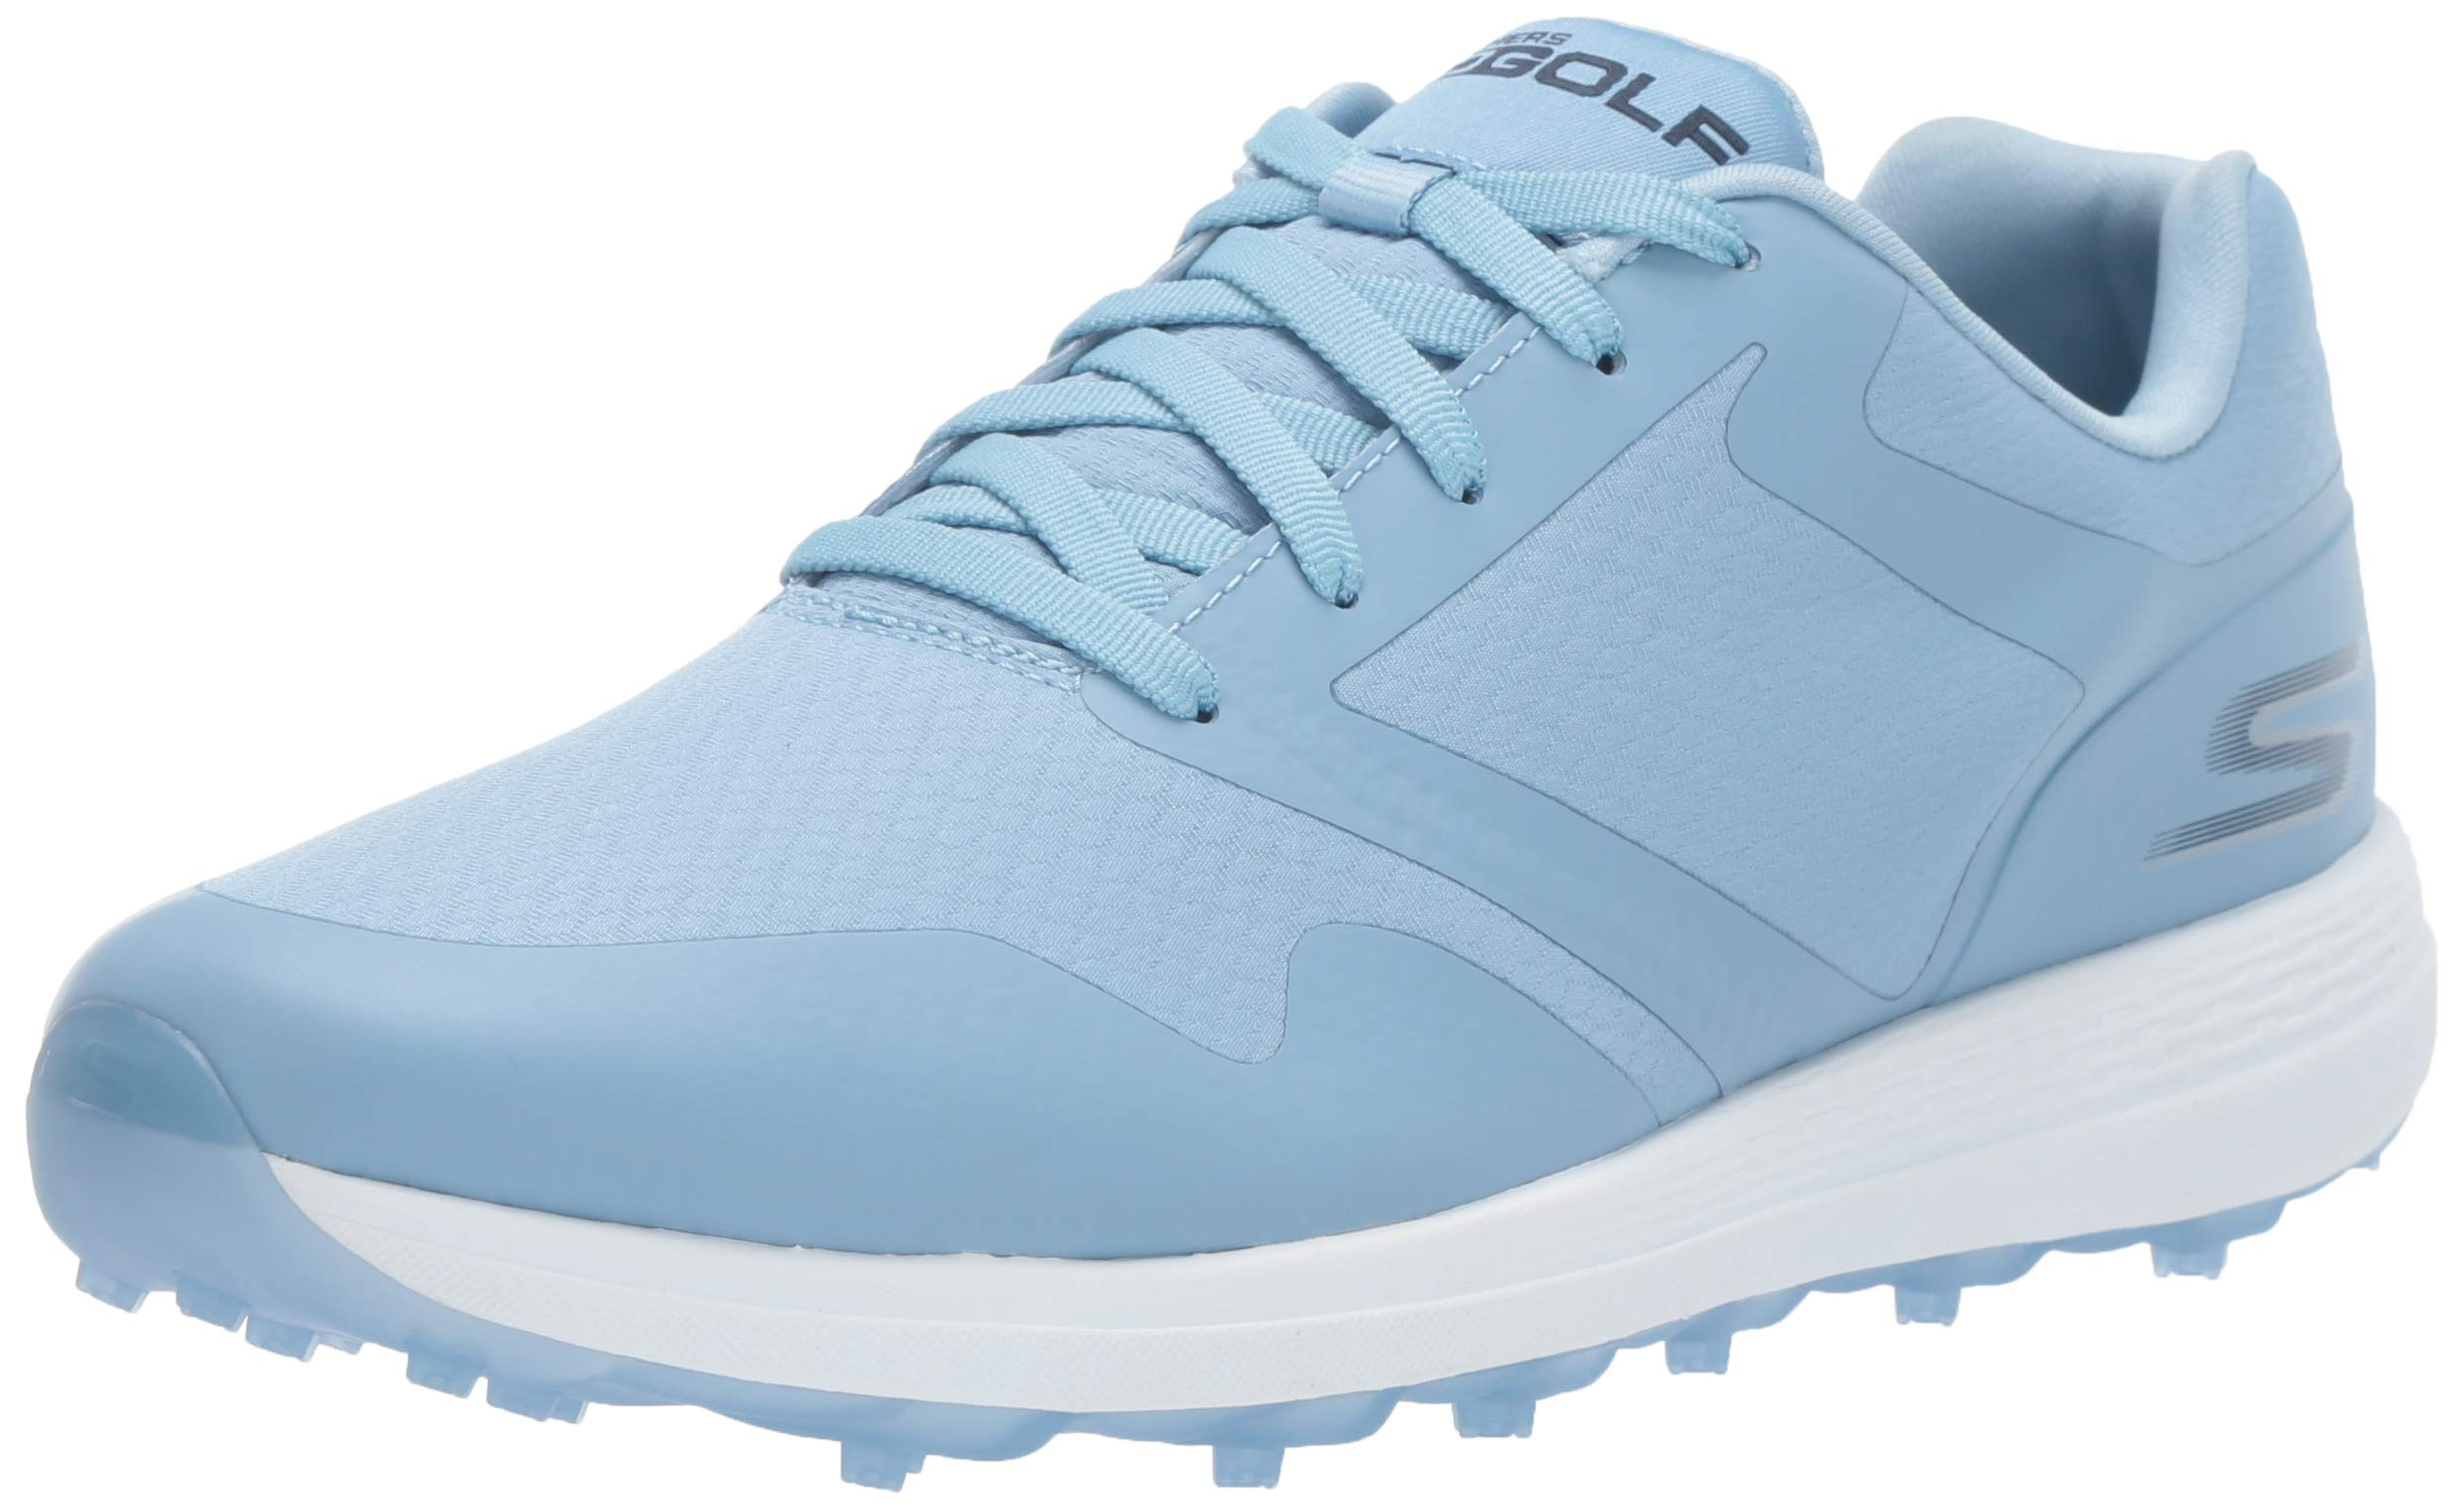 Skechers Women's Max Golf Shoe, Light Blue, 5.5 M US